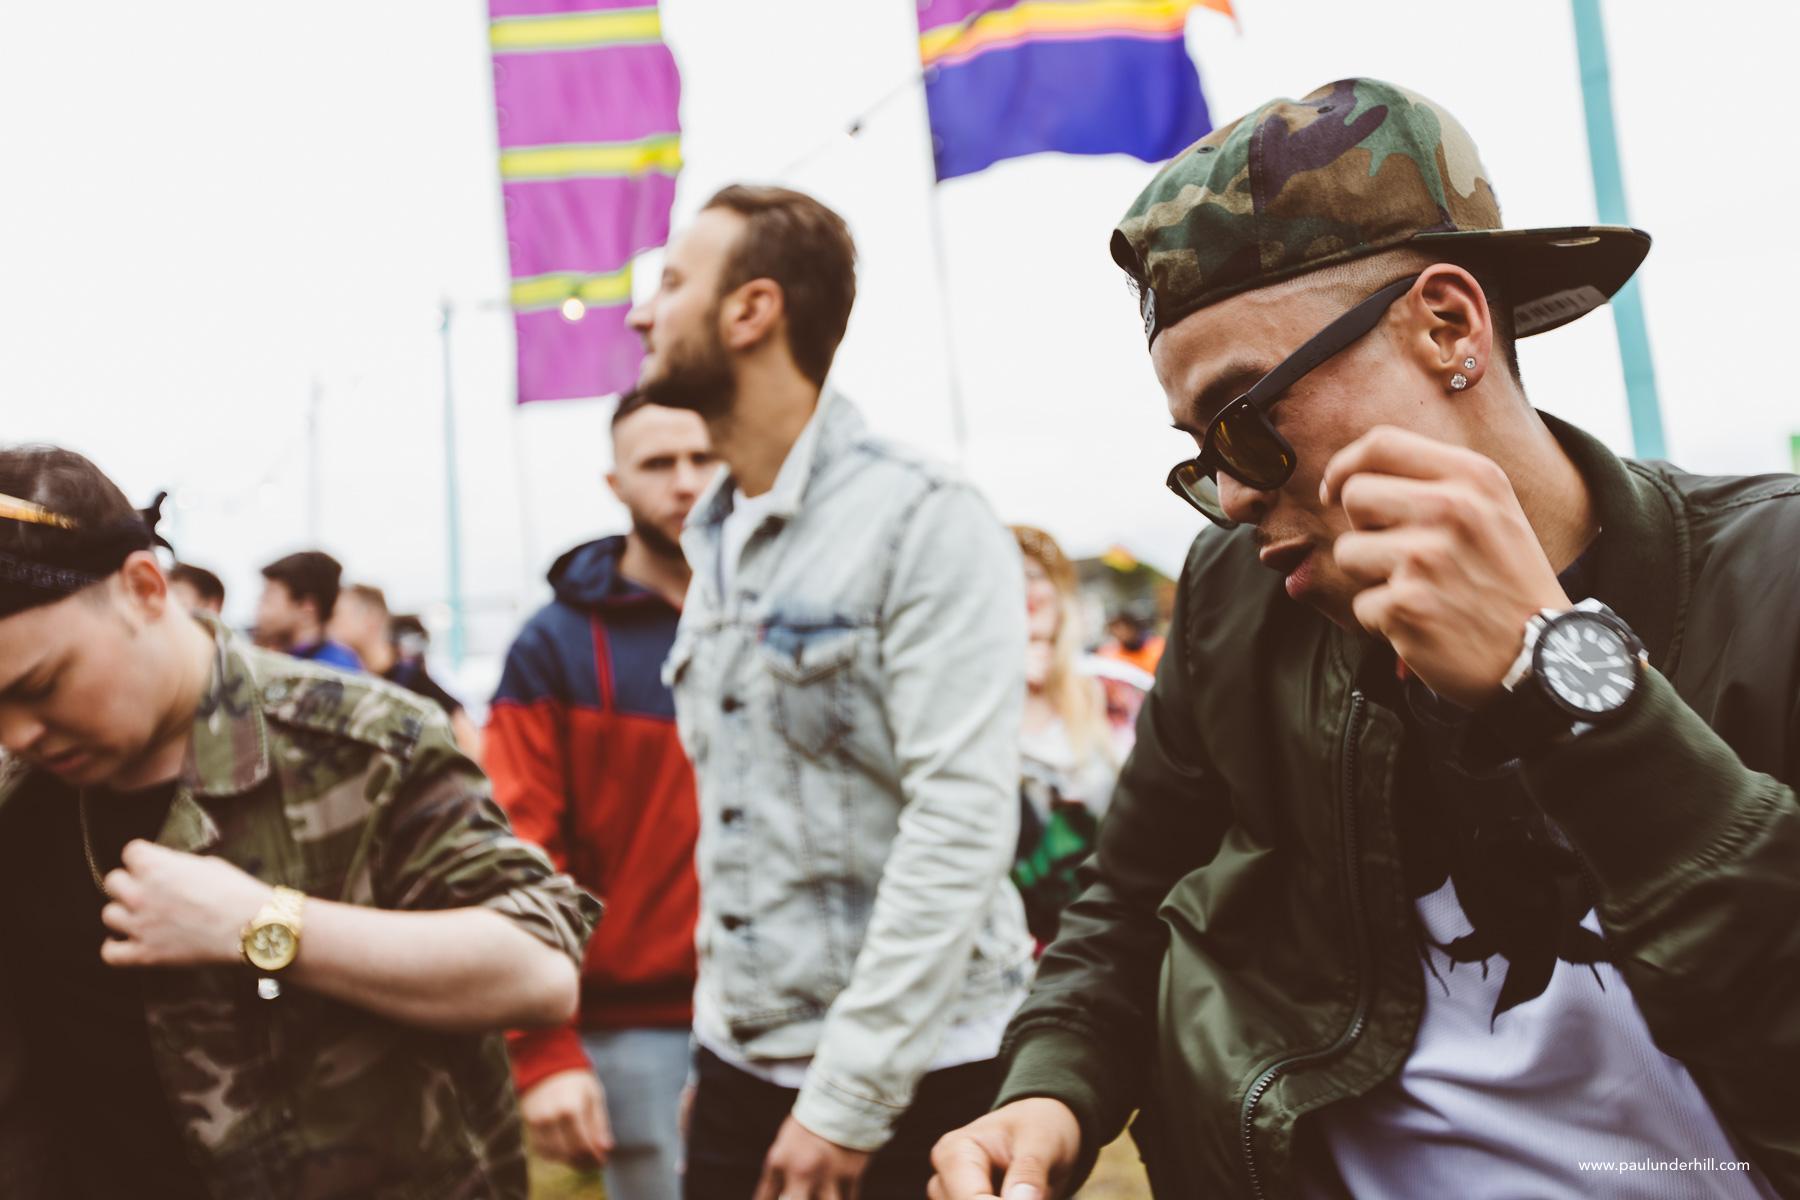 Festival-photographers-00003